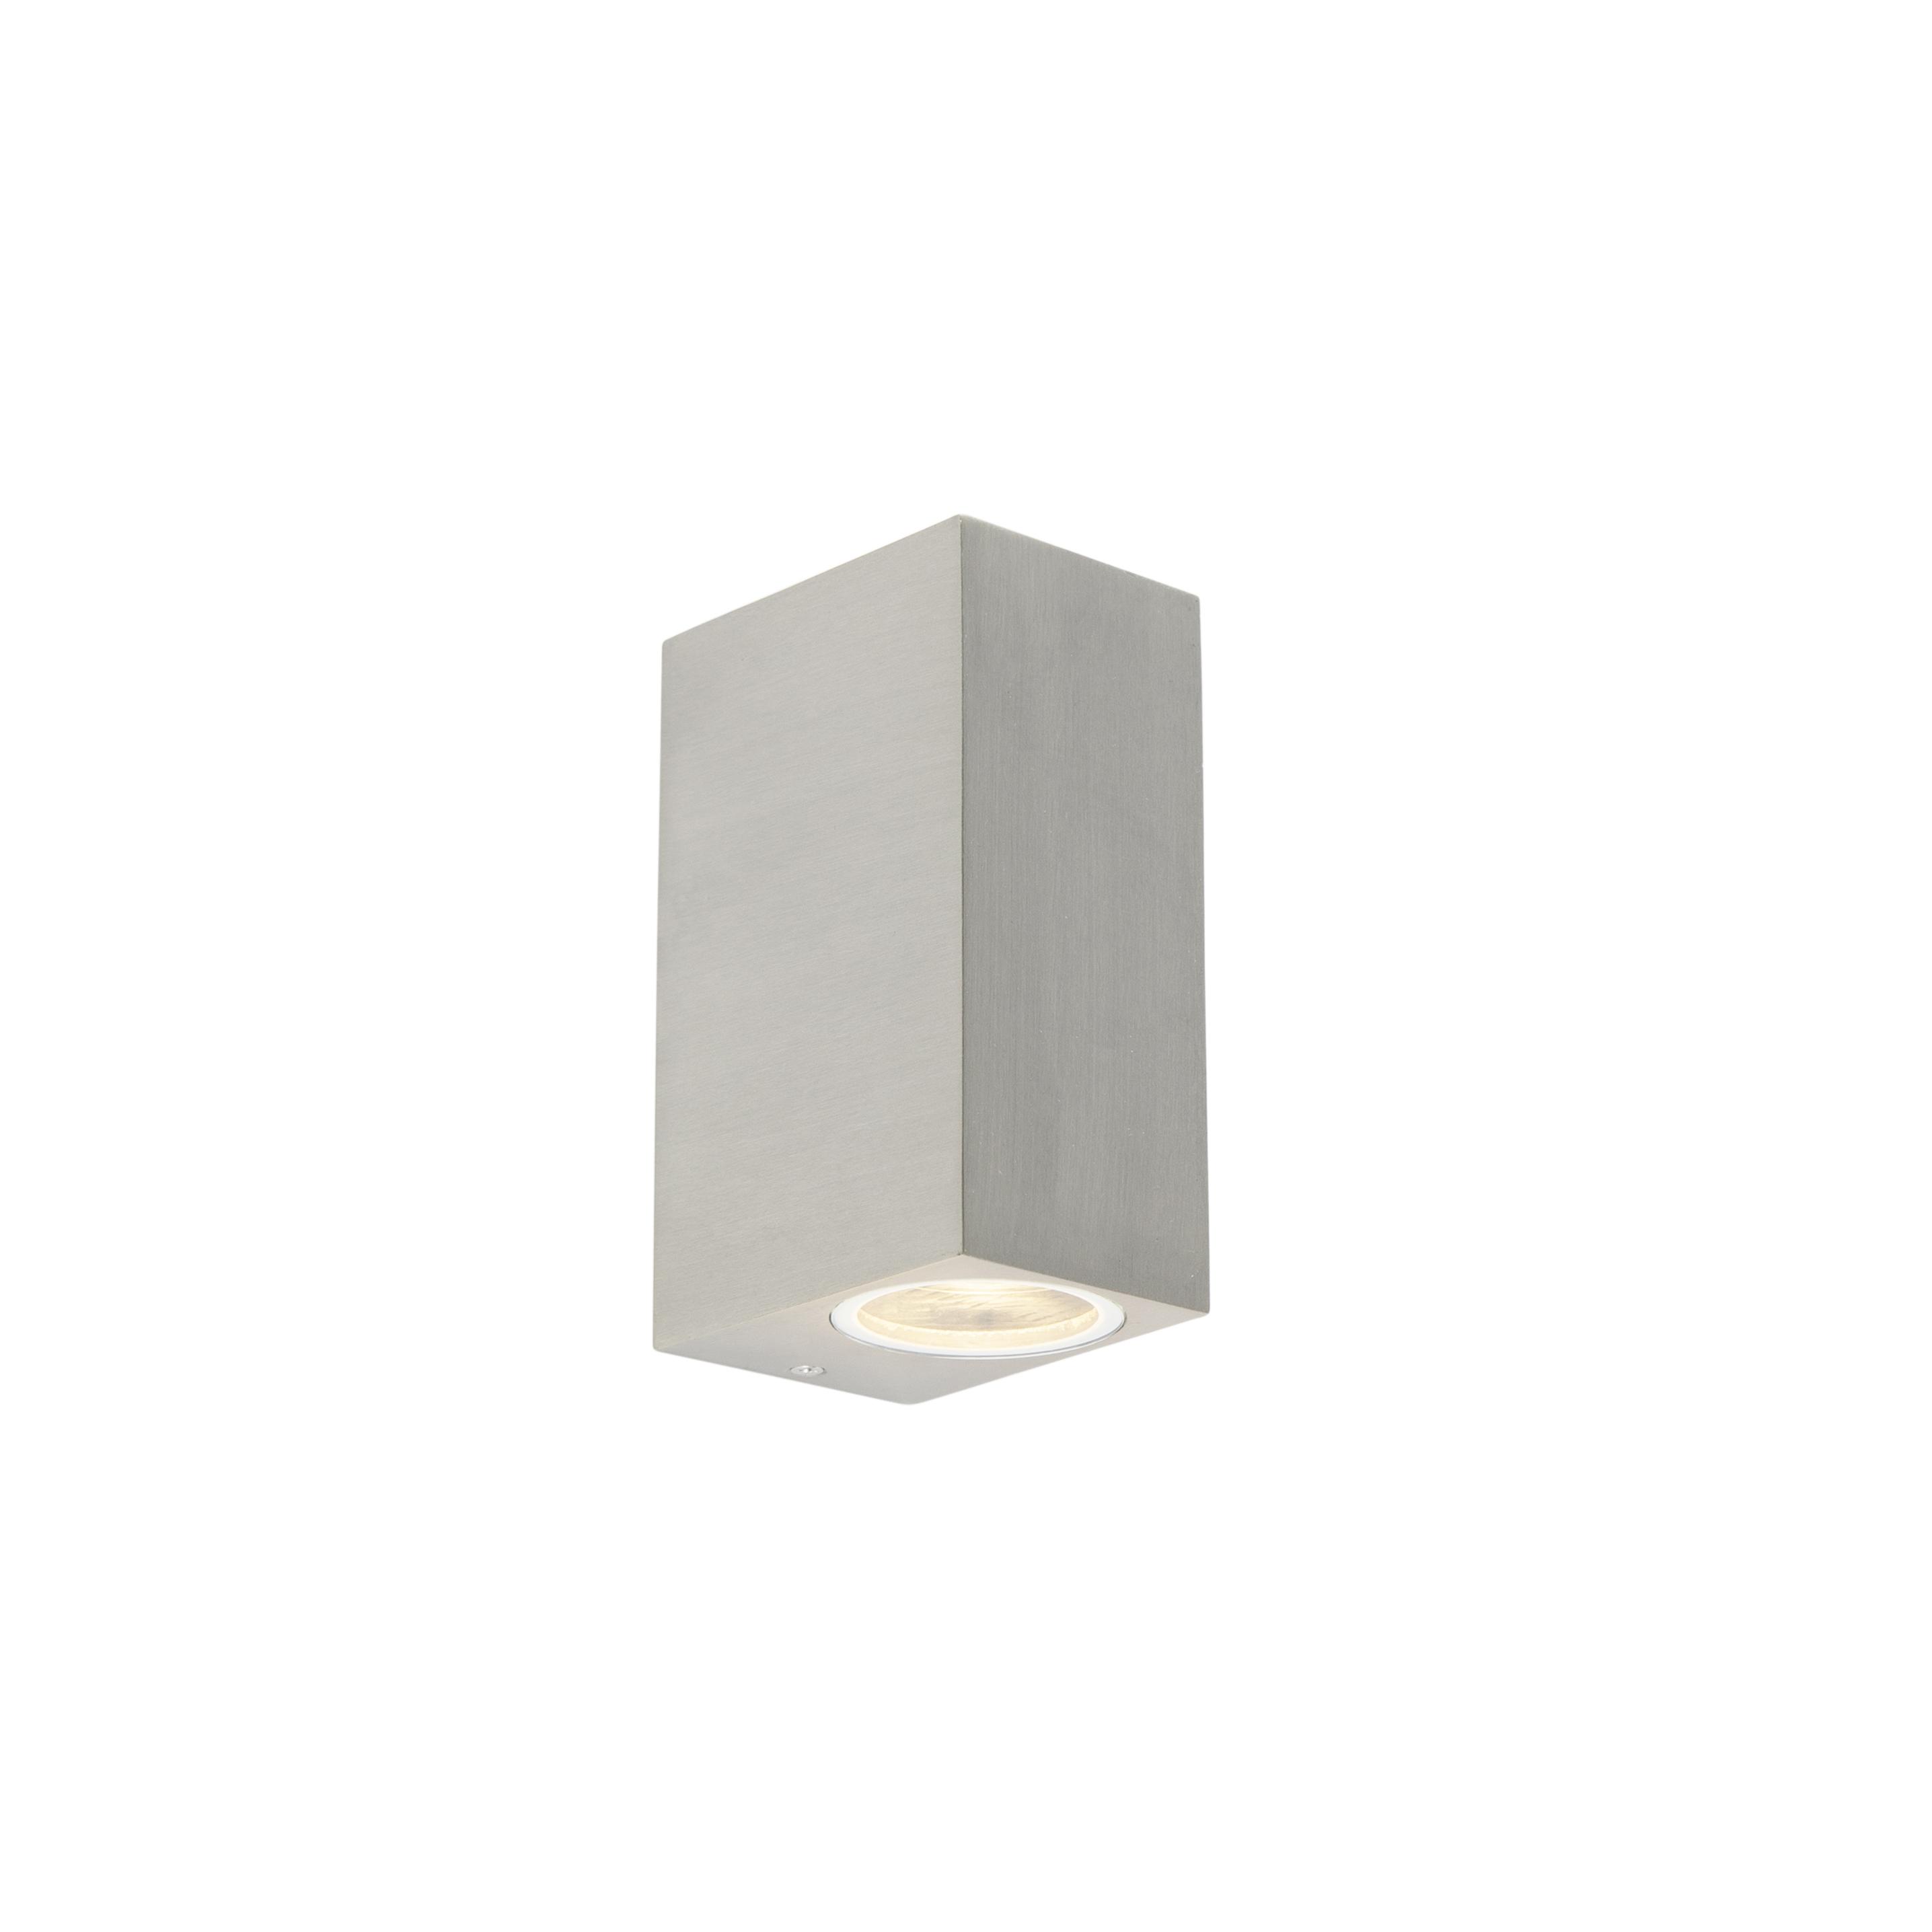 Set van 2 moderne wandlampen aluminium IP44 - Baleno II